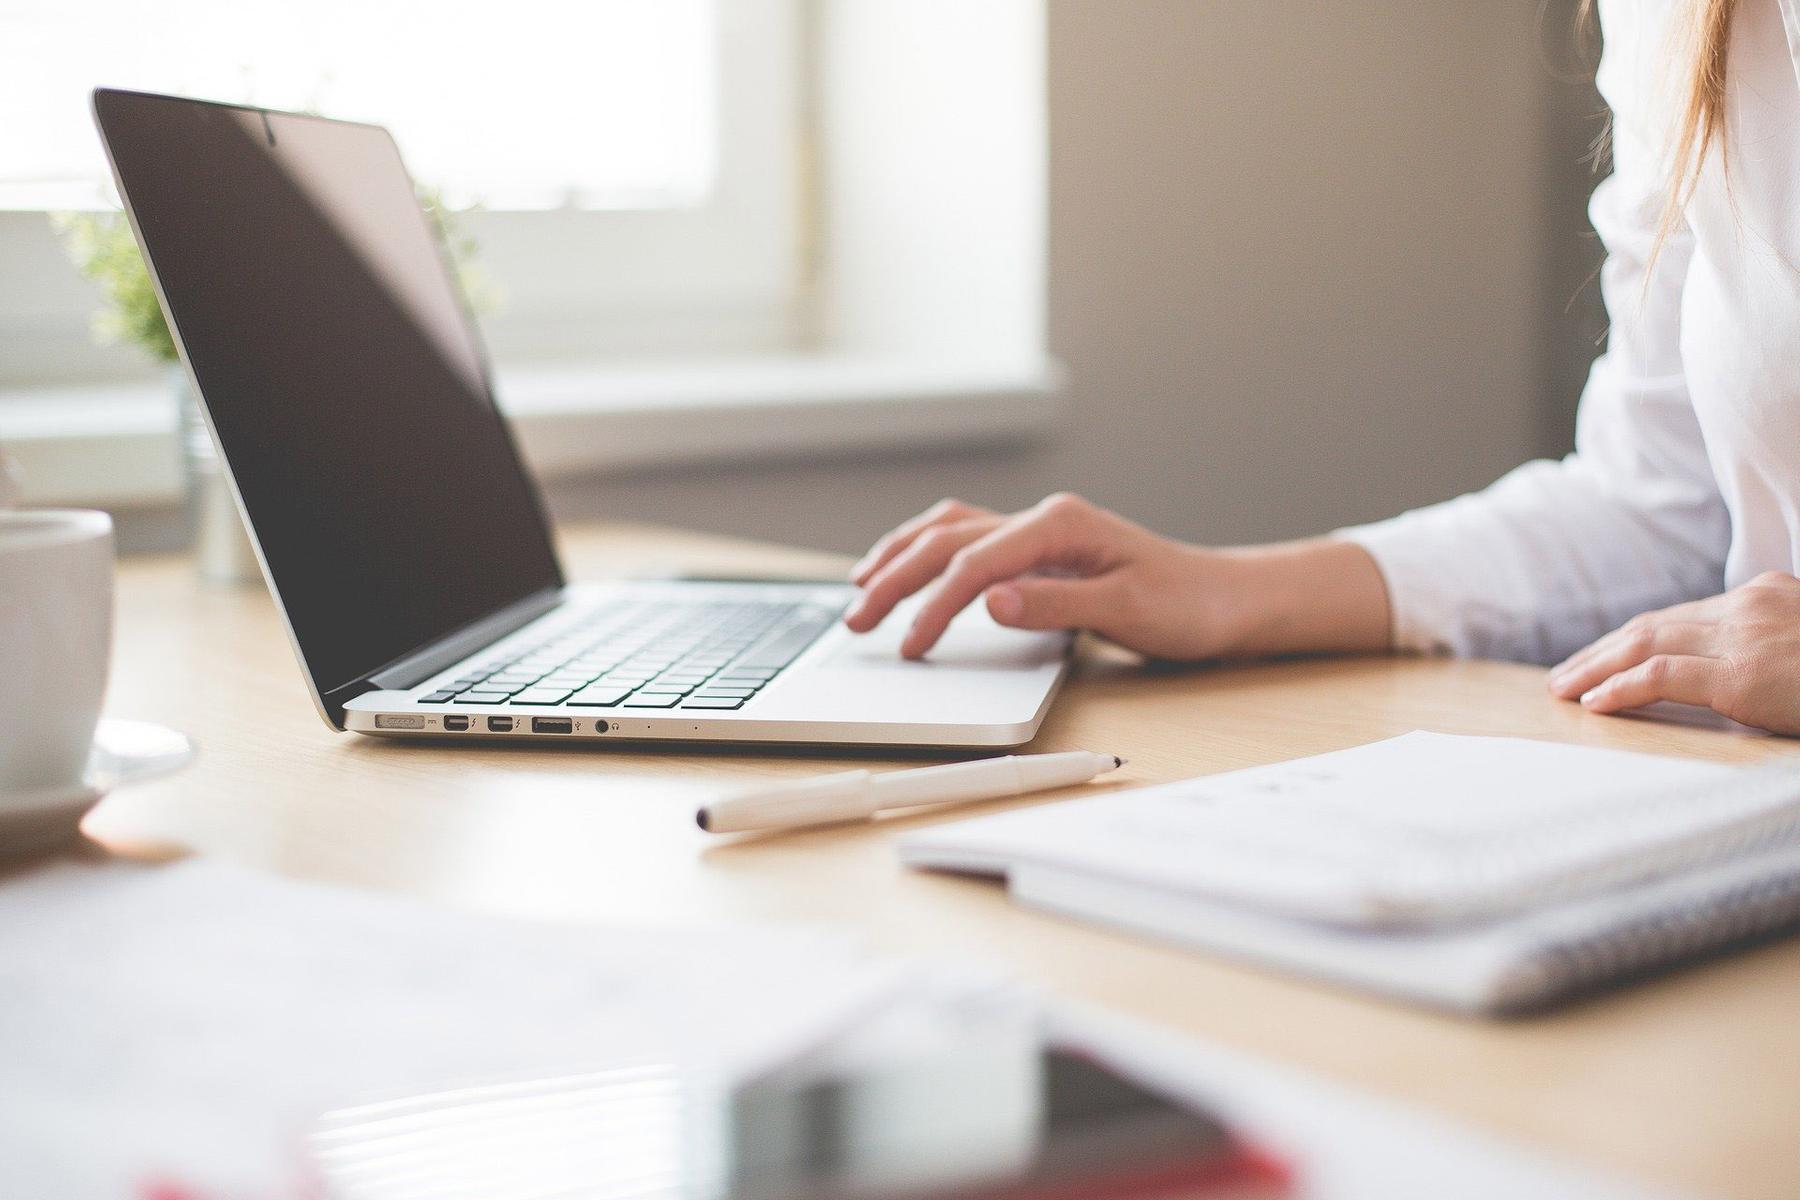 Frau an Laptop mit Notizblock